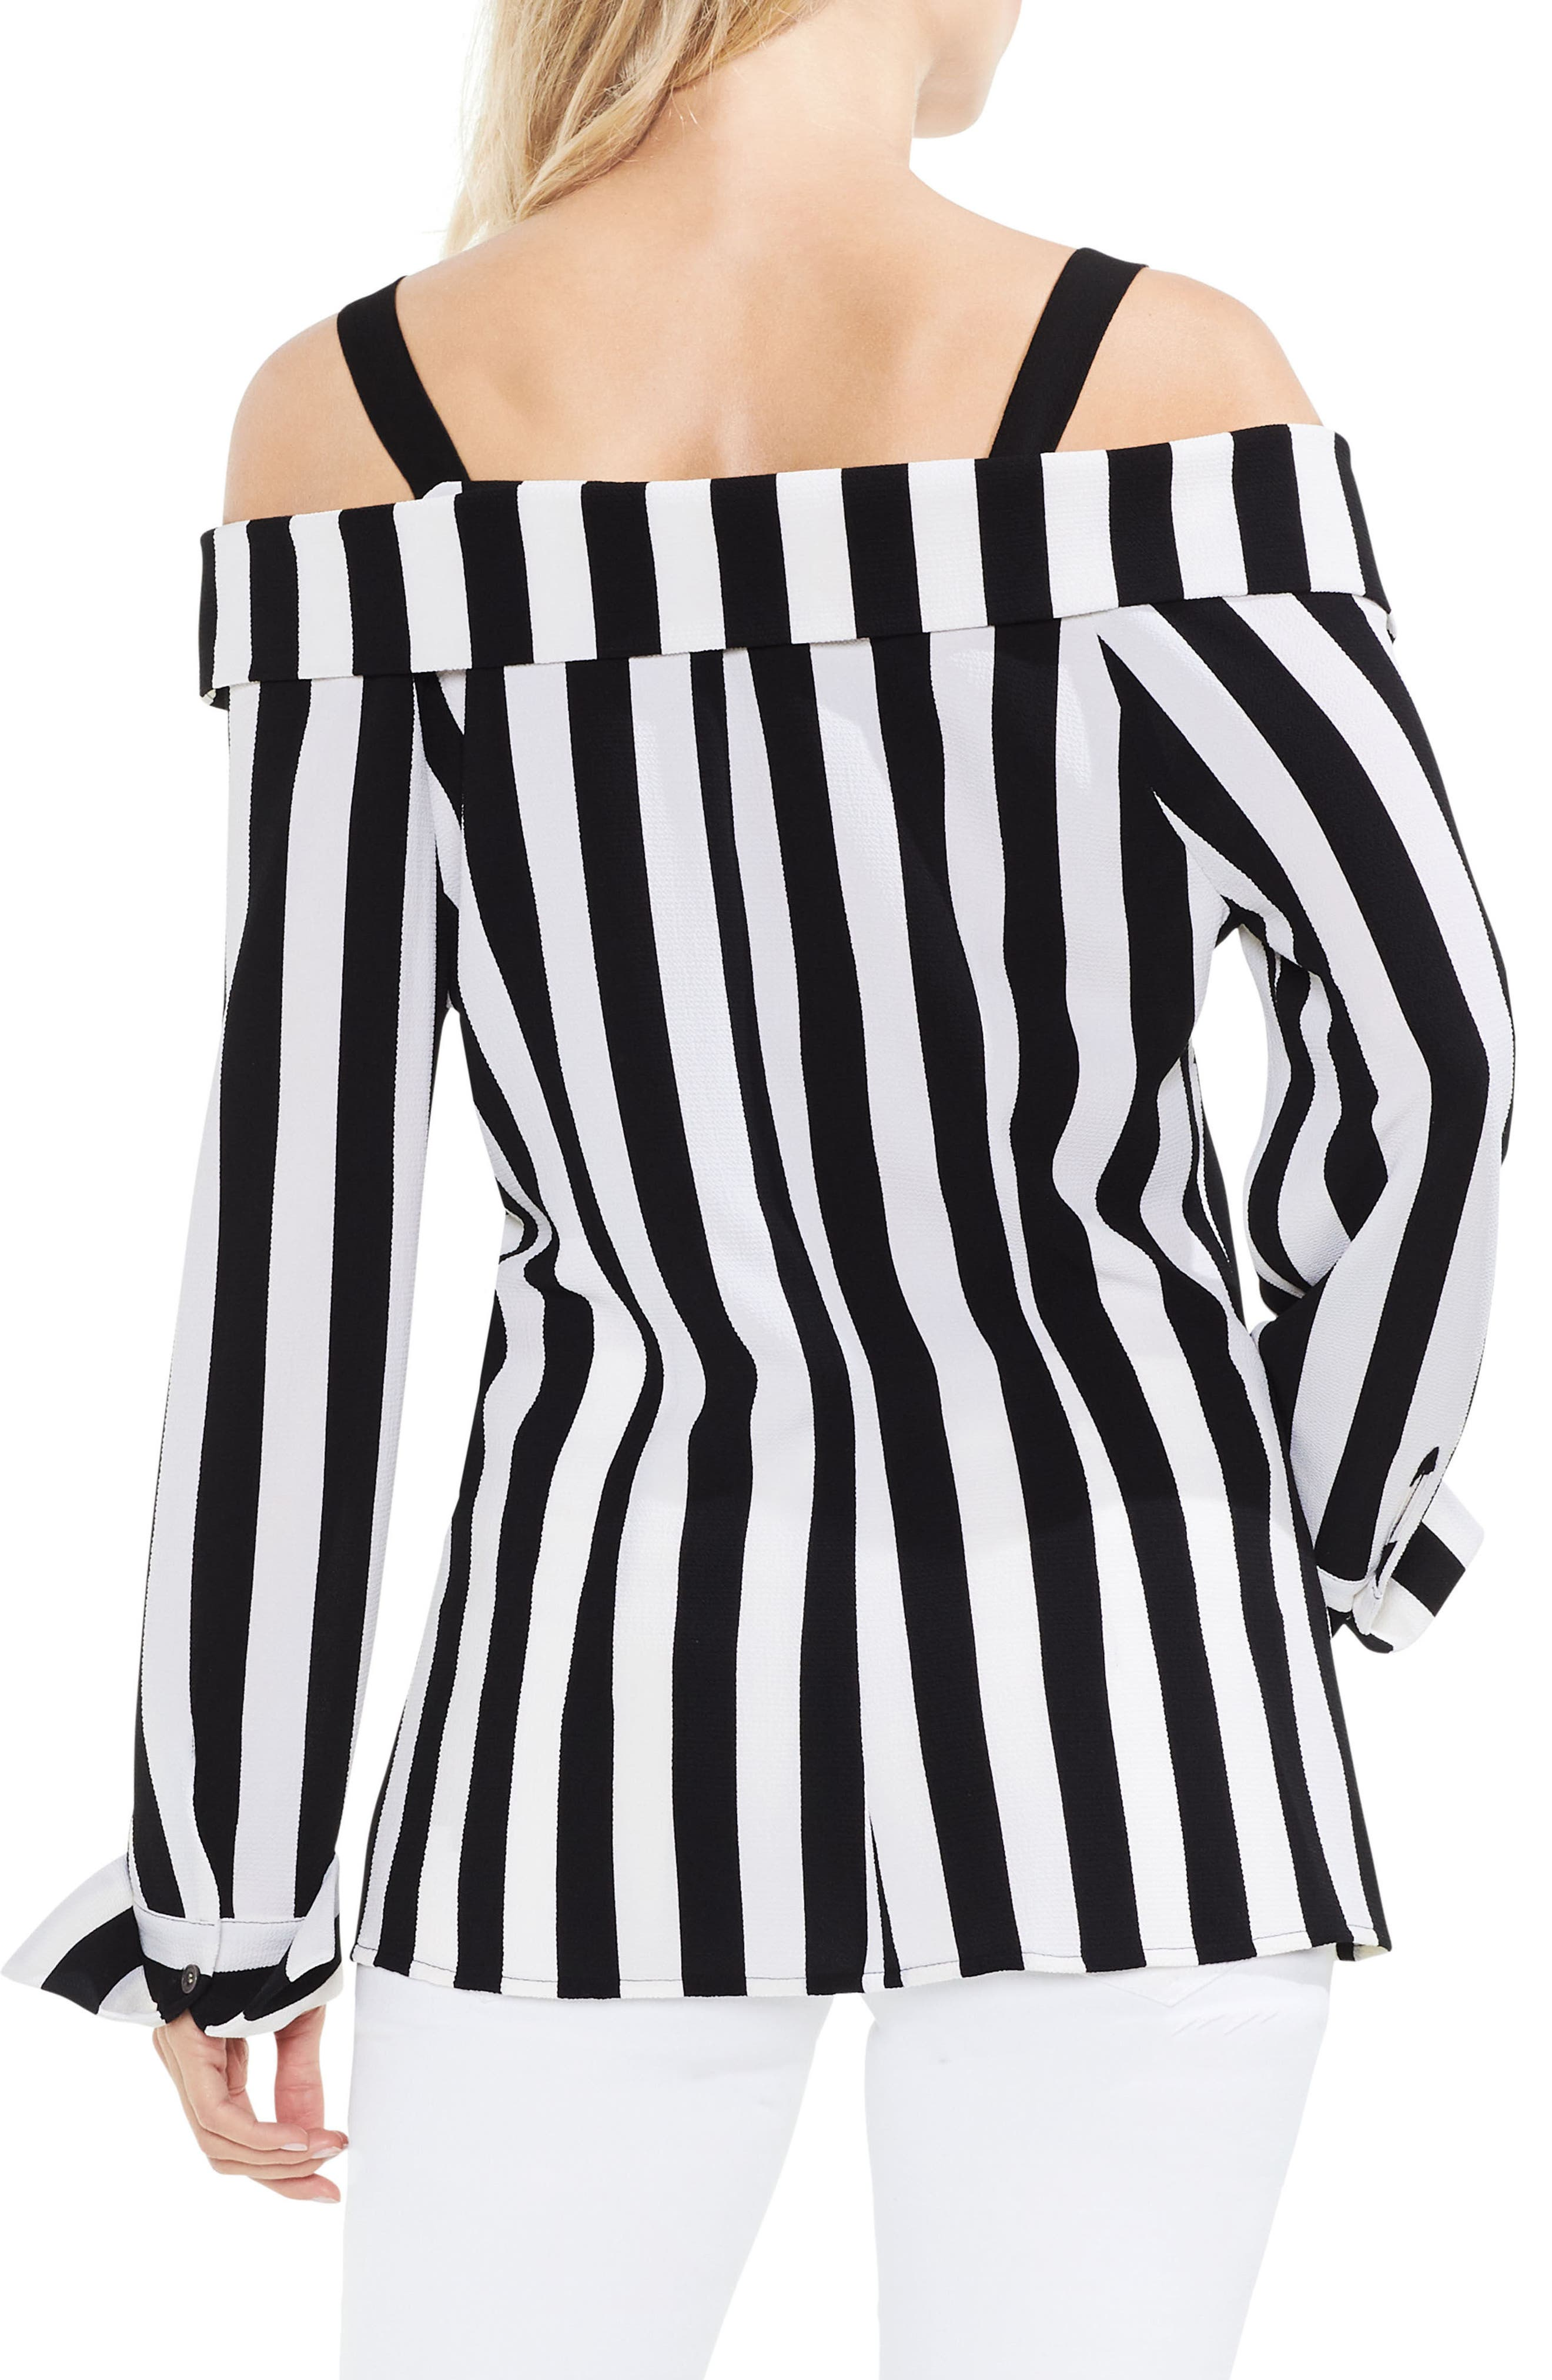 Spectator Stripe Off the Shoulder Blouse,                             Alternate thumbnail 2, color,                             Rich Black